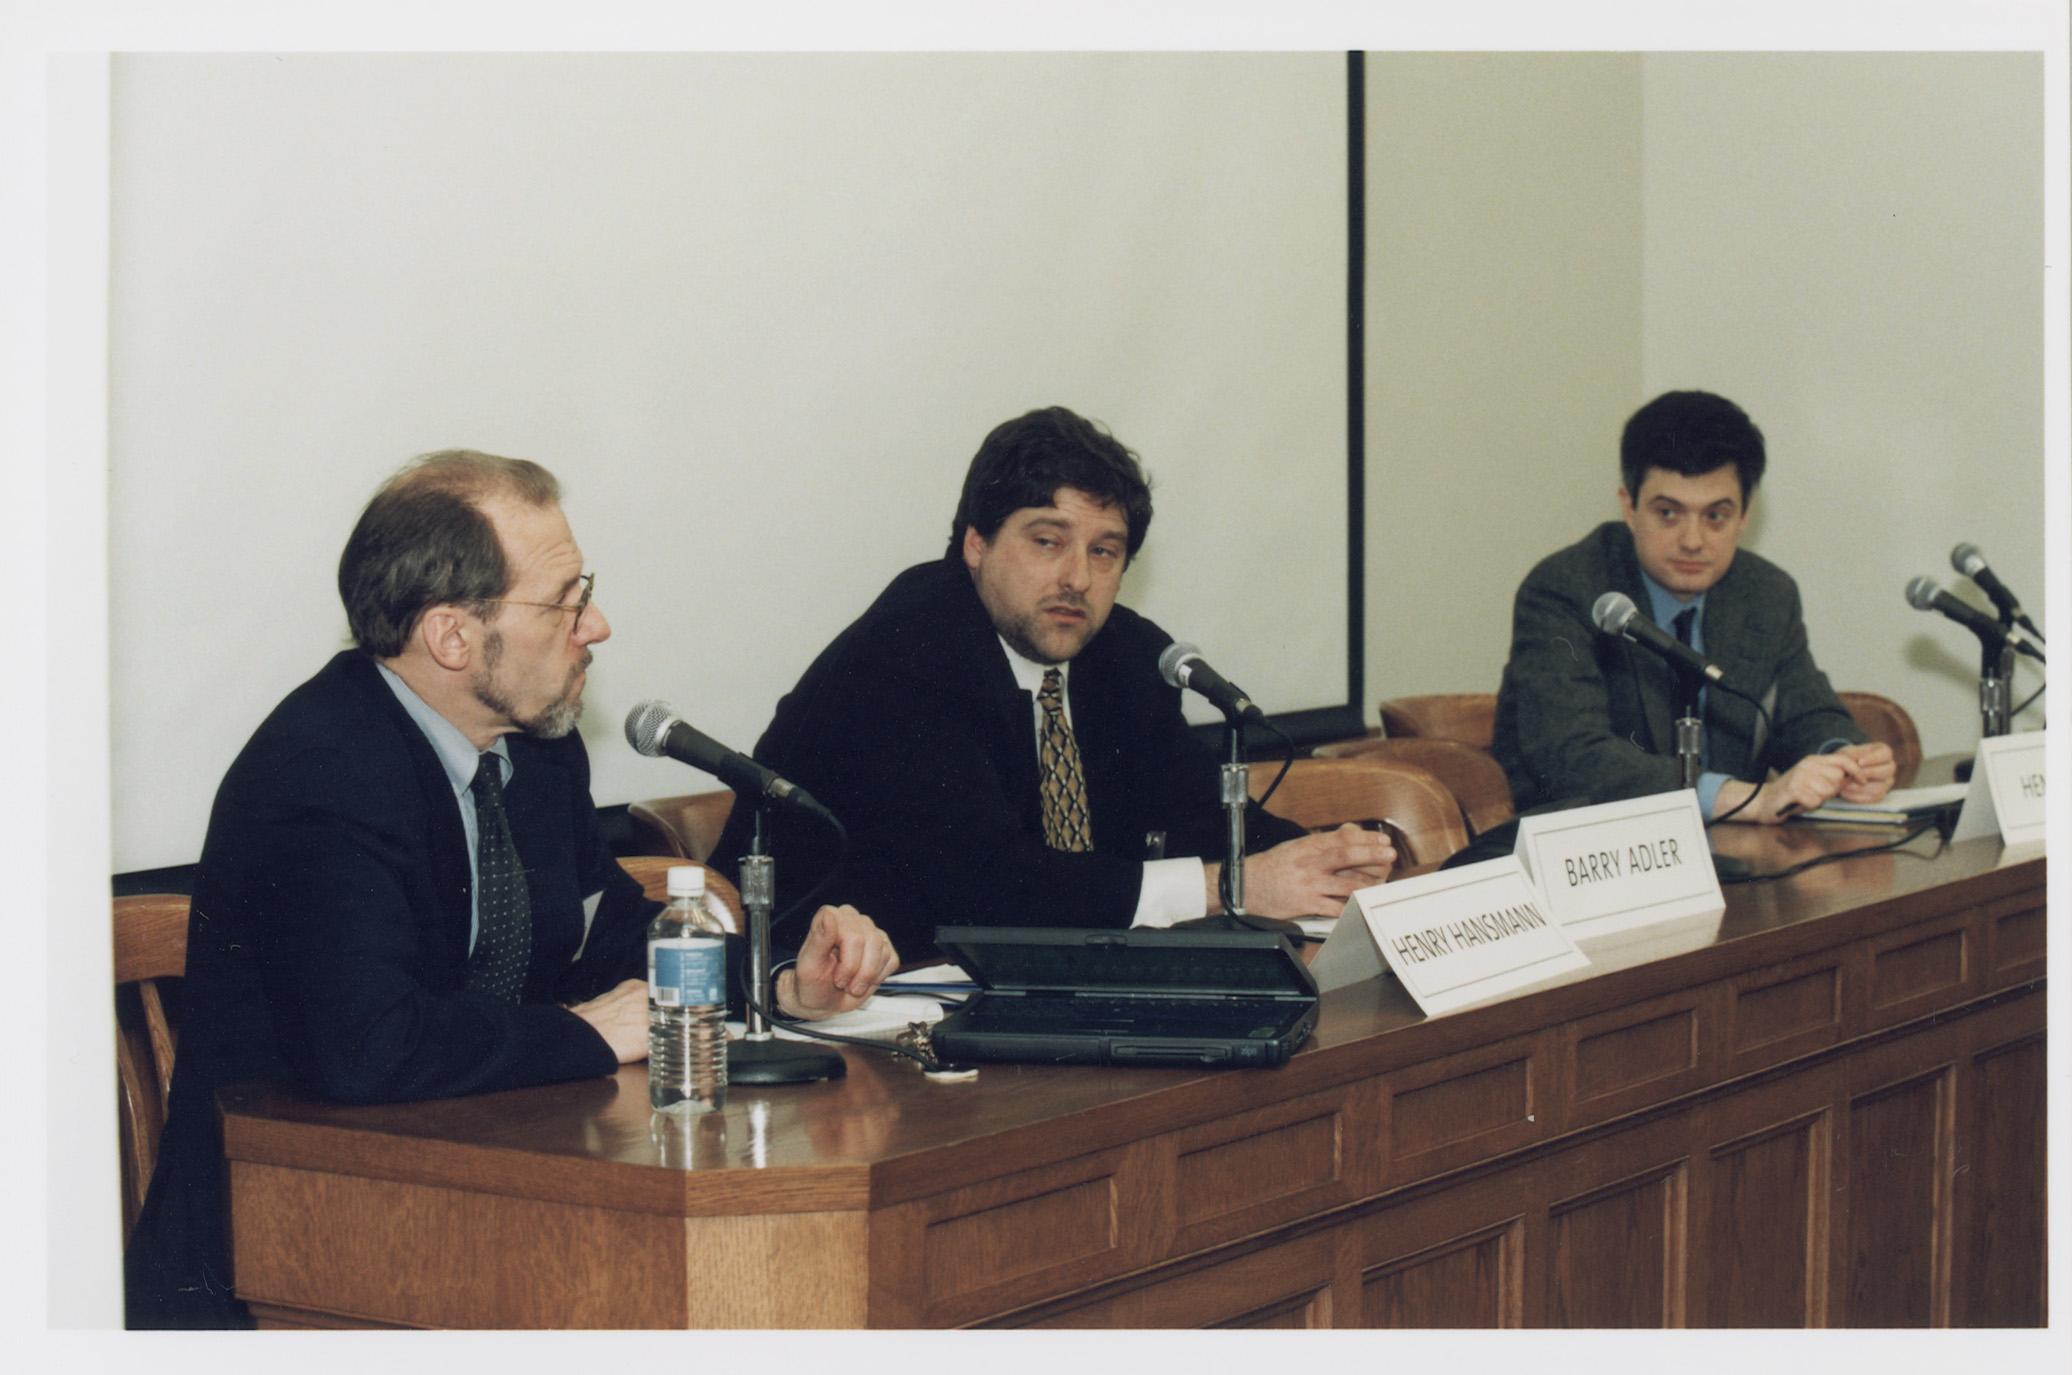 YLS Prof. Henry Hansmann '74, NYU Law Prof. Barry E. Adler, and Visiting YLS Prof. Henry Smith '96